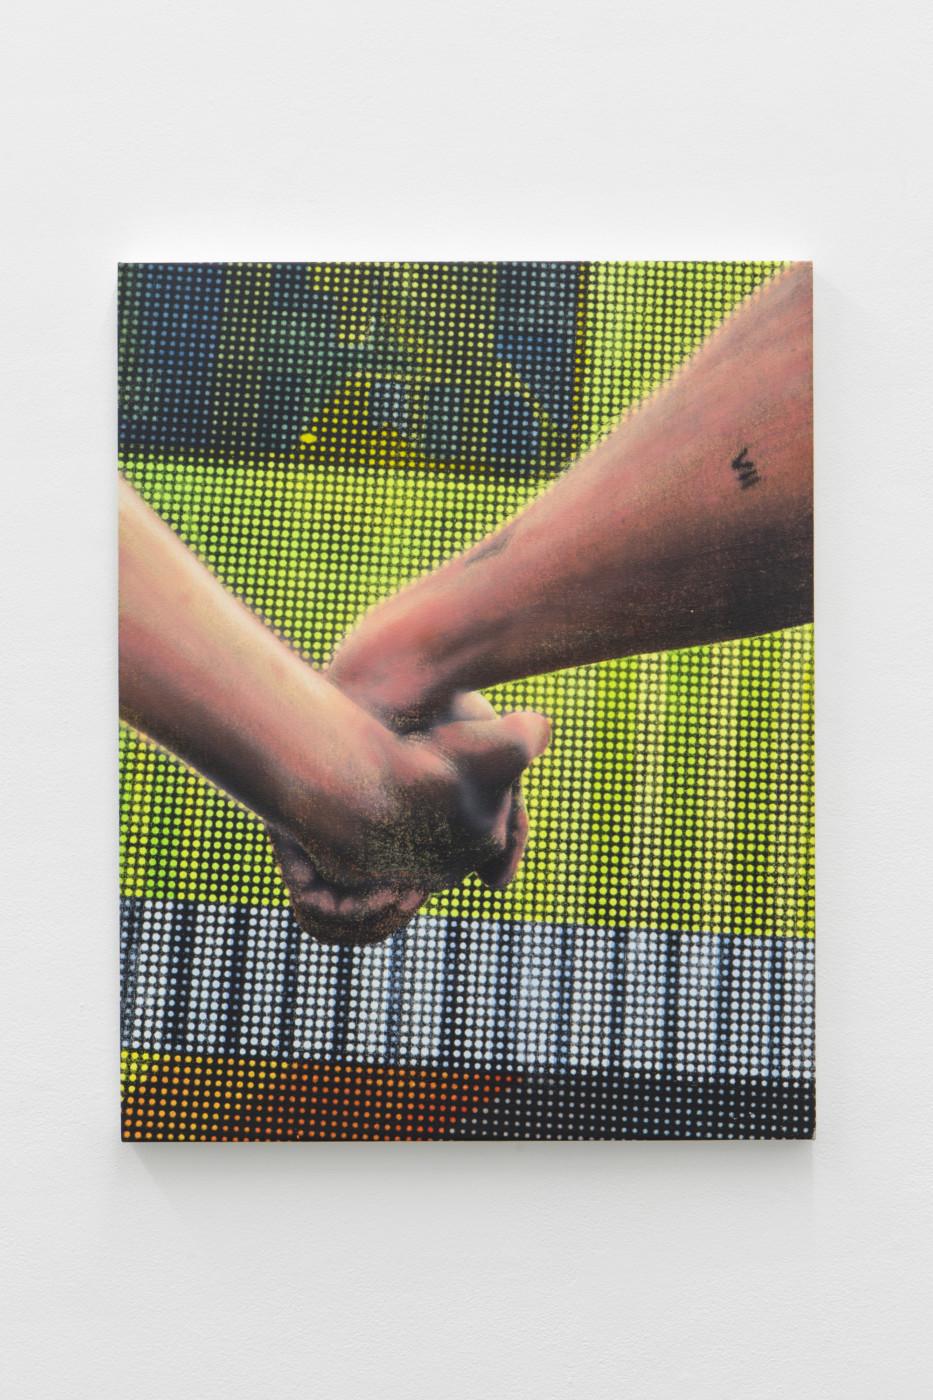 ALAN MICHAEL  Untitled , 2018 Silkscreen and acrylic on canvas 86 x 68 cm / 33.8 x 26.3 in - High Art Gallery Paris